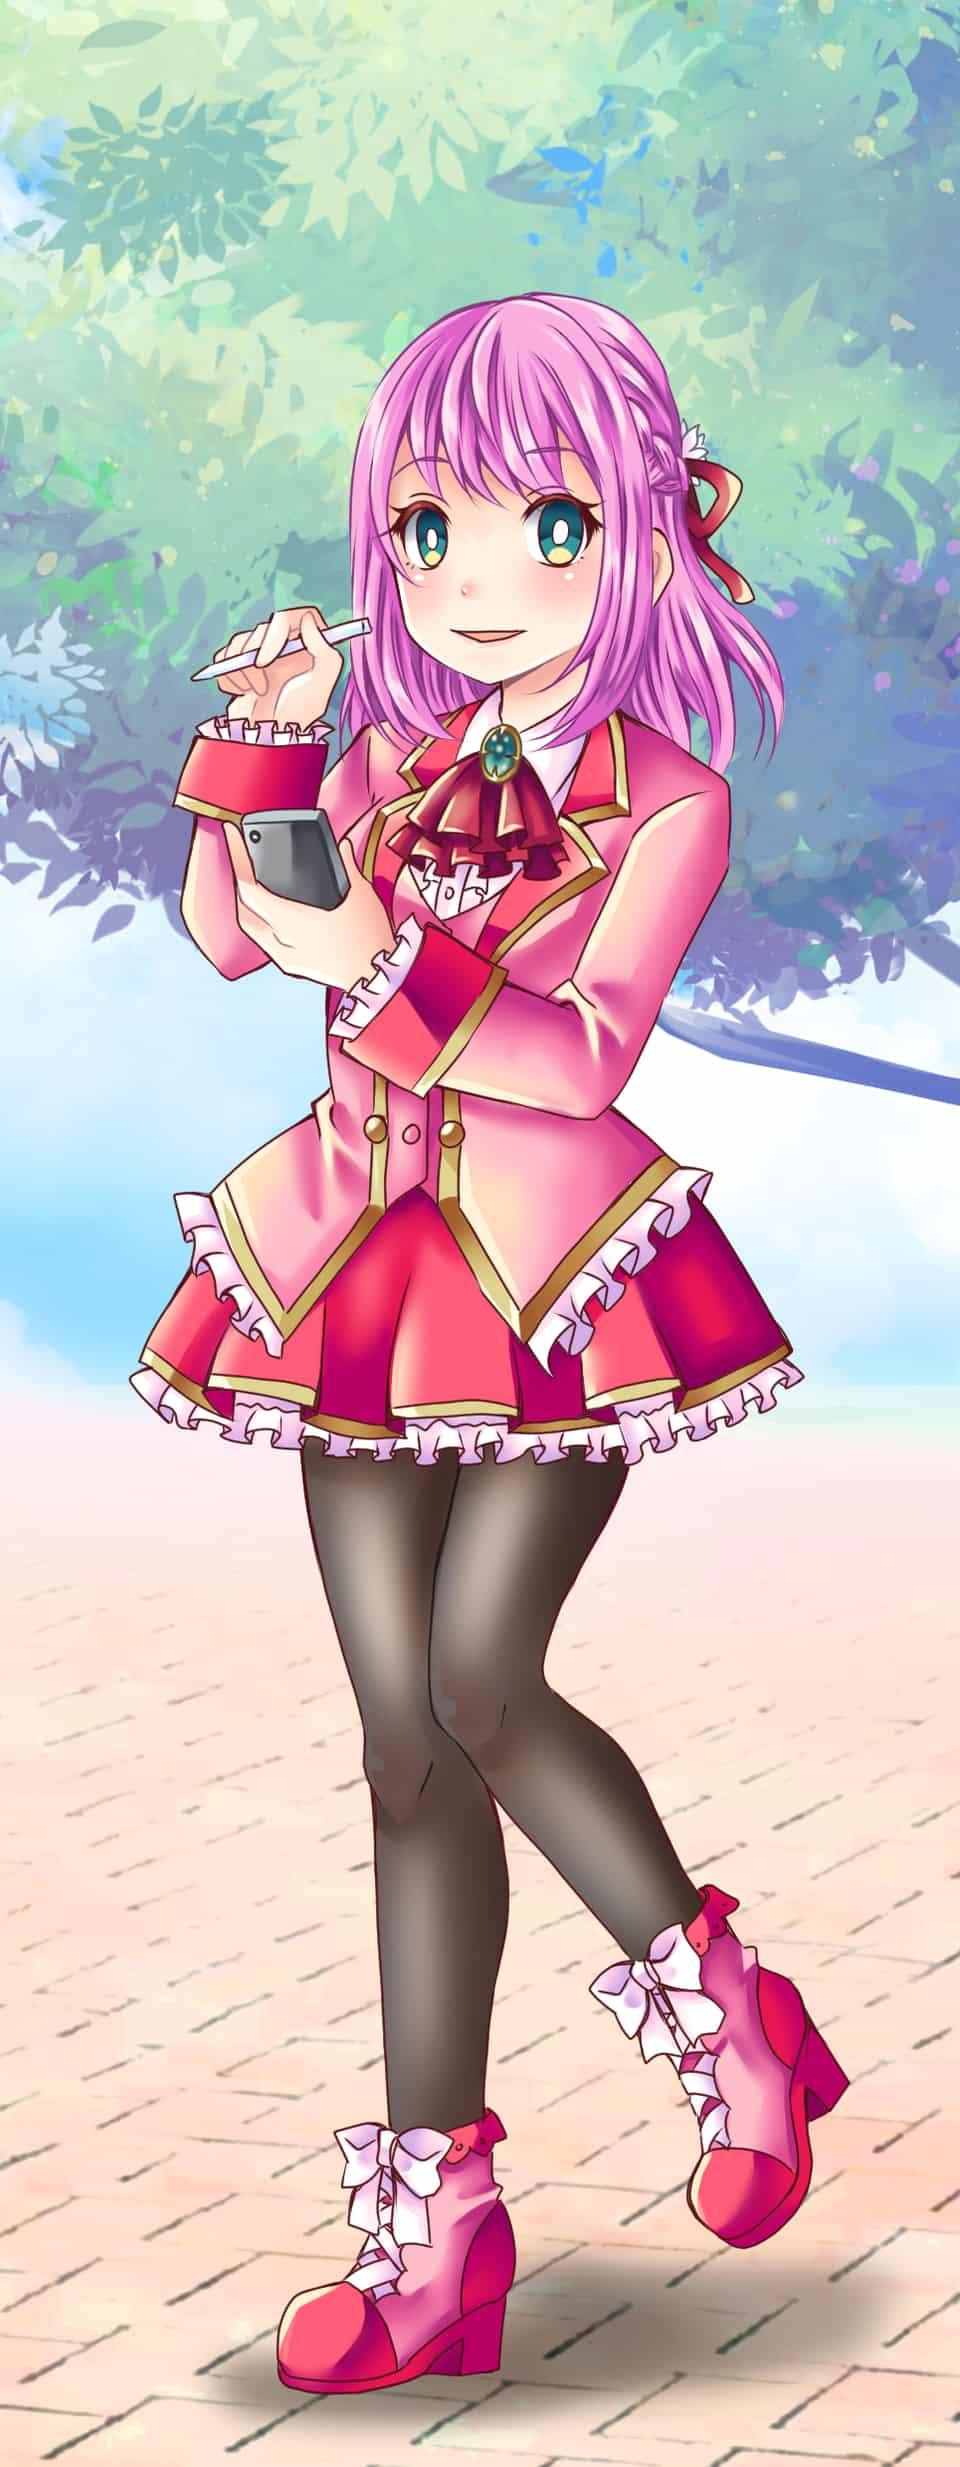 PINK Illust of ひらい祐夢 PASTEL_SKETCH2020 original girl pinkhair pink